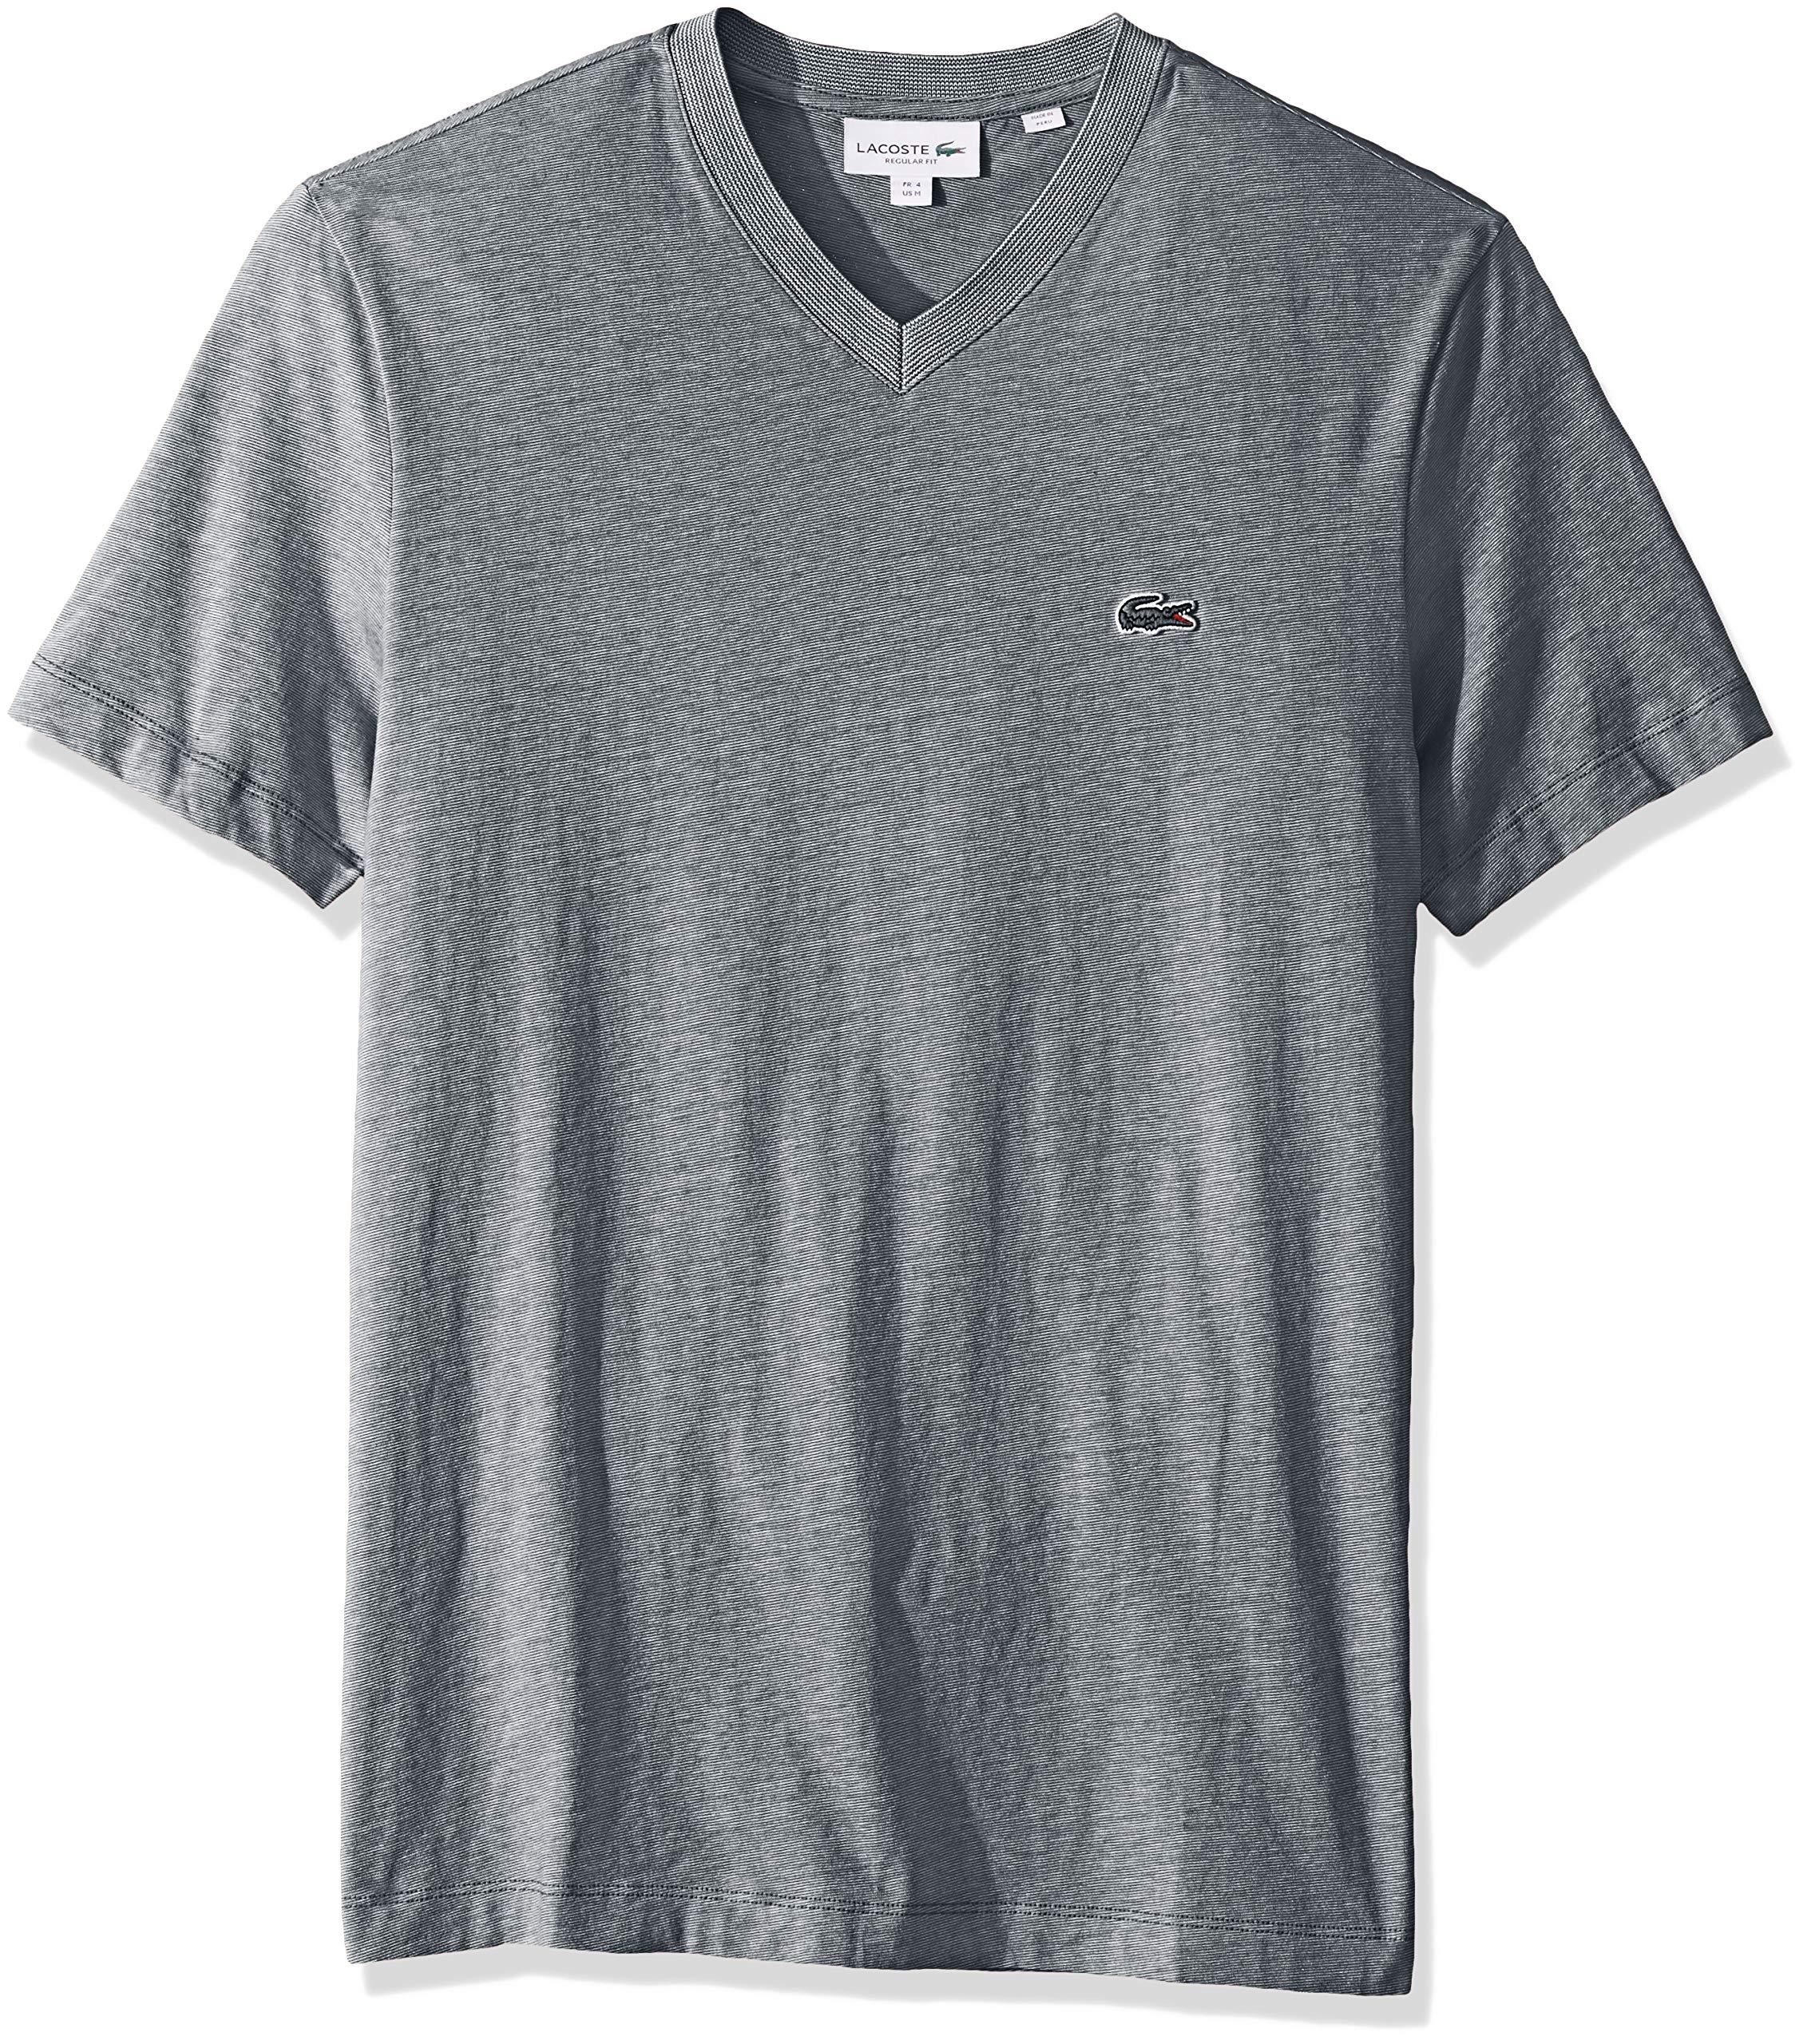 c173577b Lacoste Men's S/S Striped Jersey Raye T-Shirt Regular FIT, Navy Blue/Flour,  4X-Large